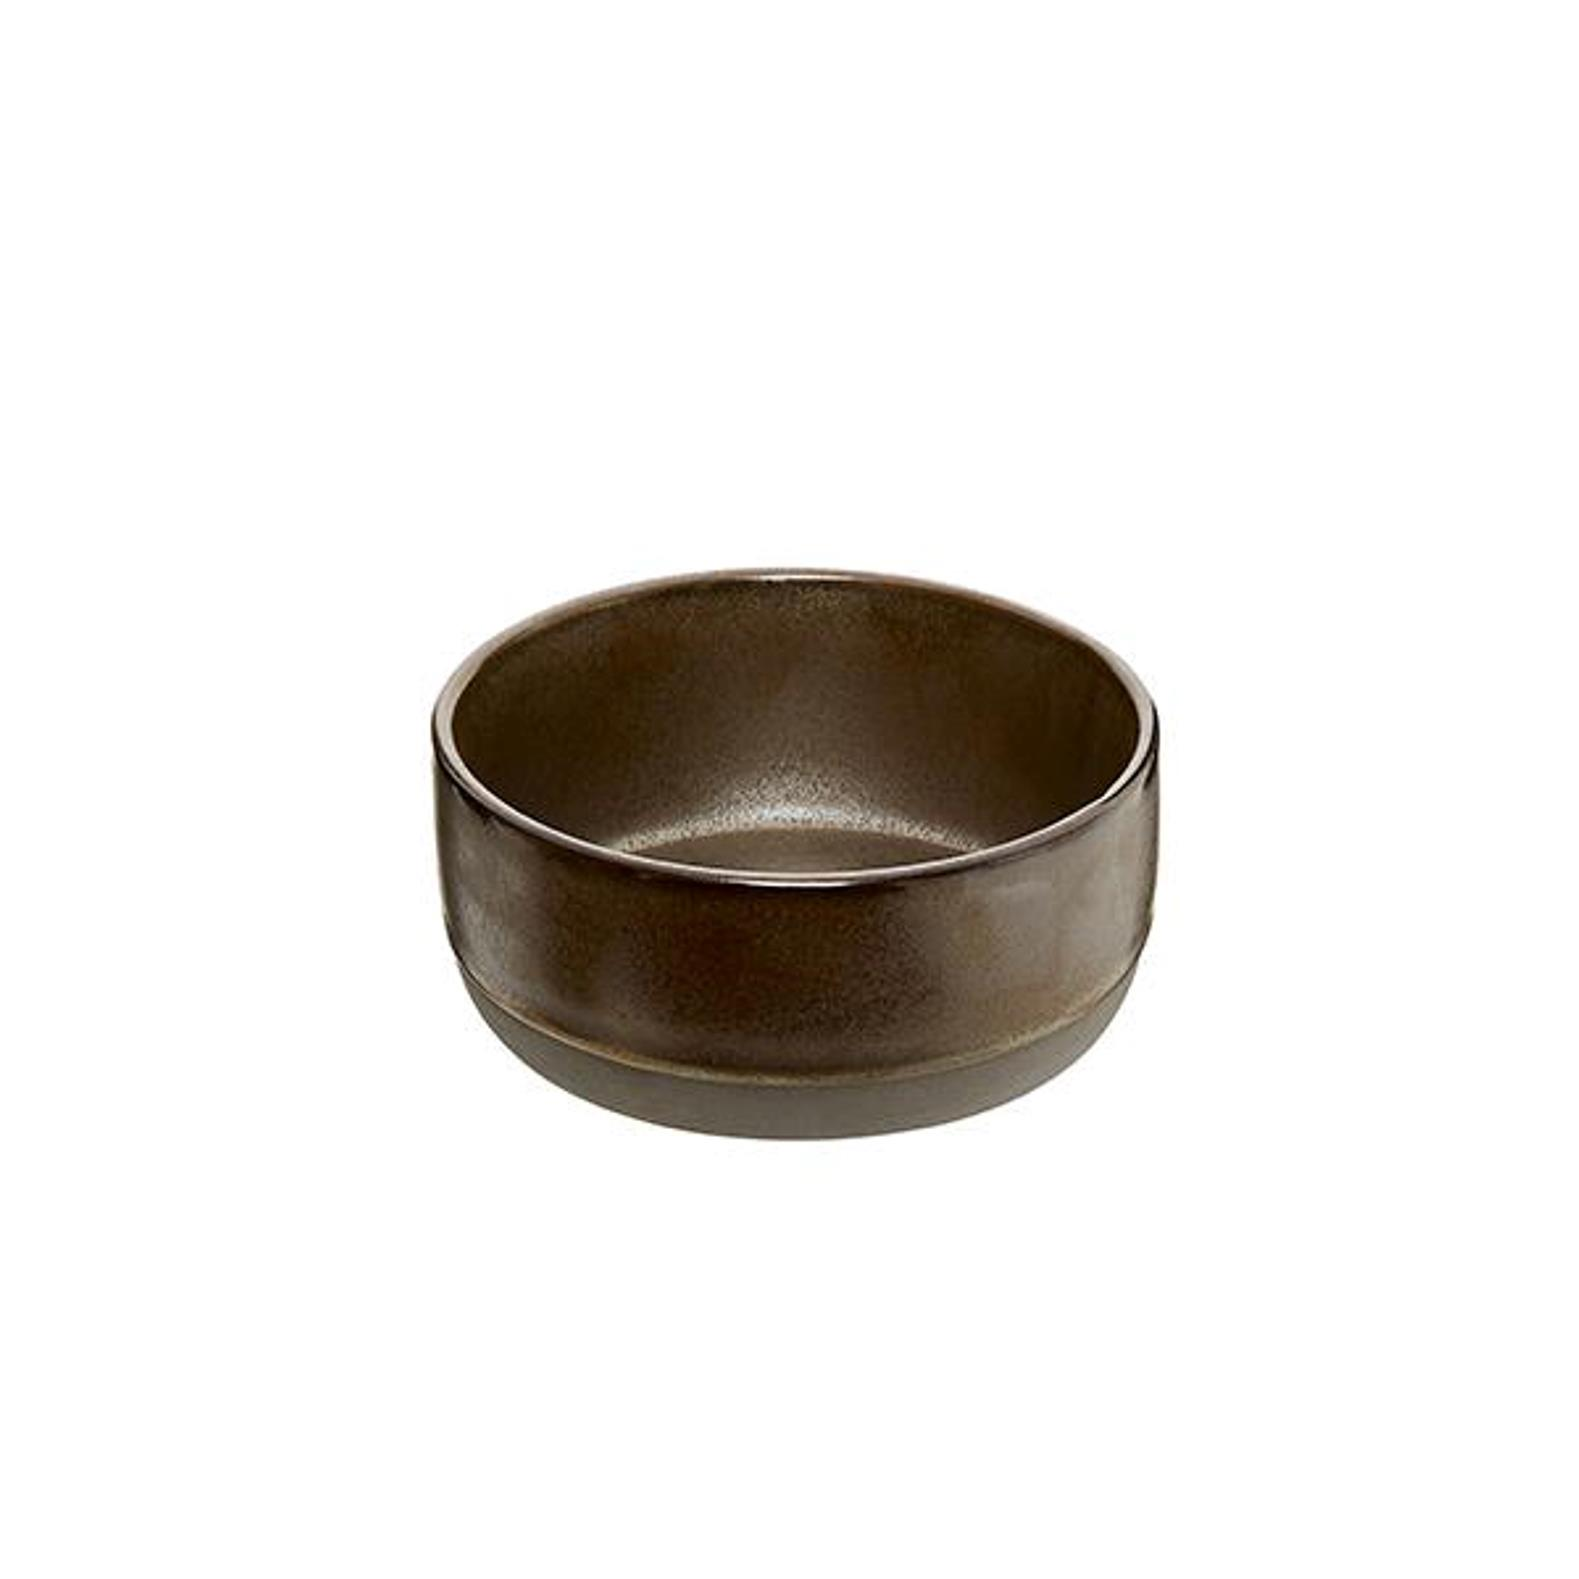 Онлайн каталог PROMENU: Пиала Aida RAW METALLIC BROWN, диаметр 13,5 см, высота 6 см, коричневый                               15563